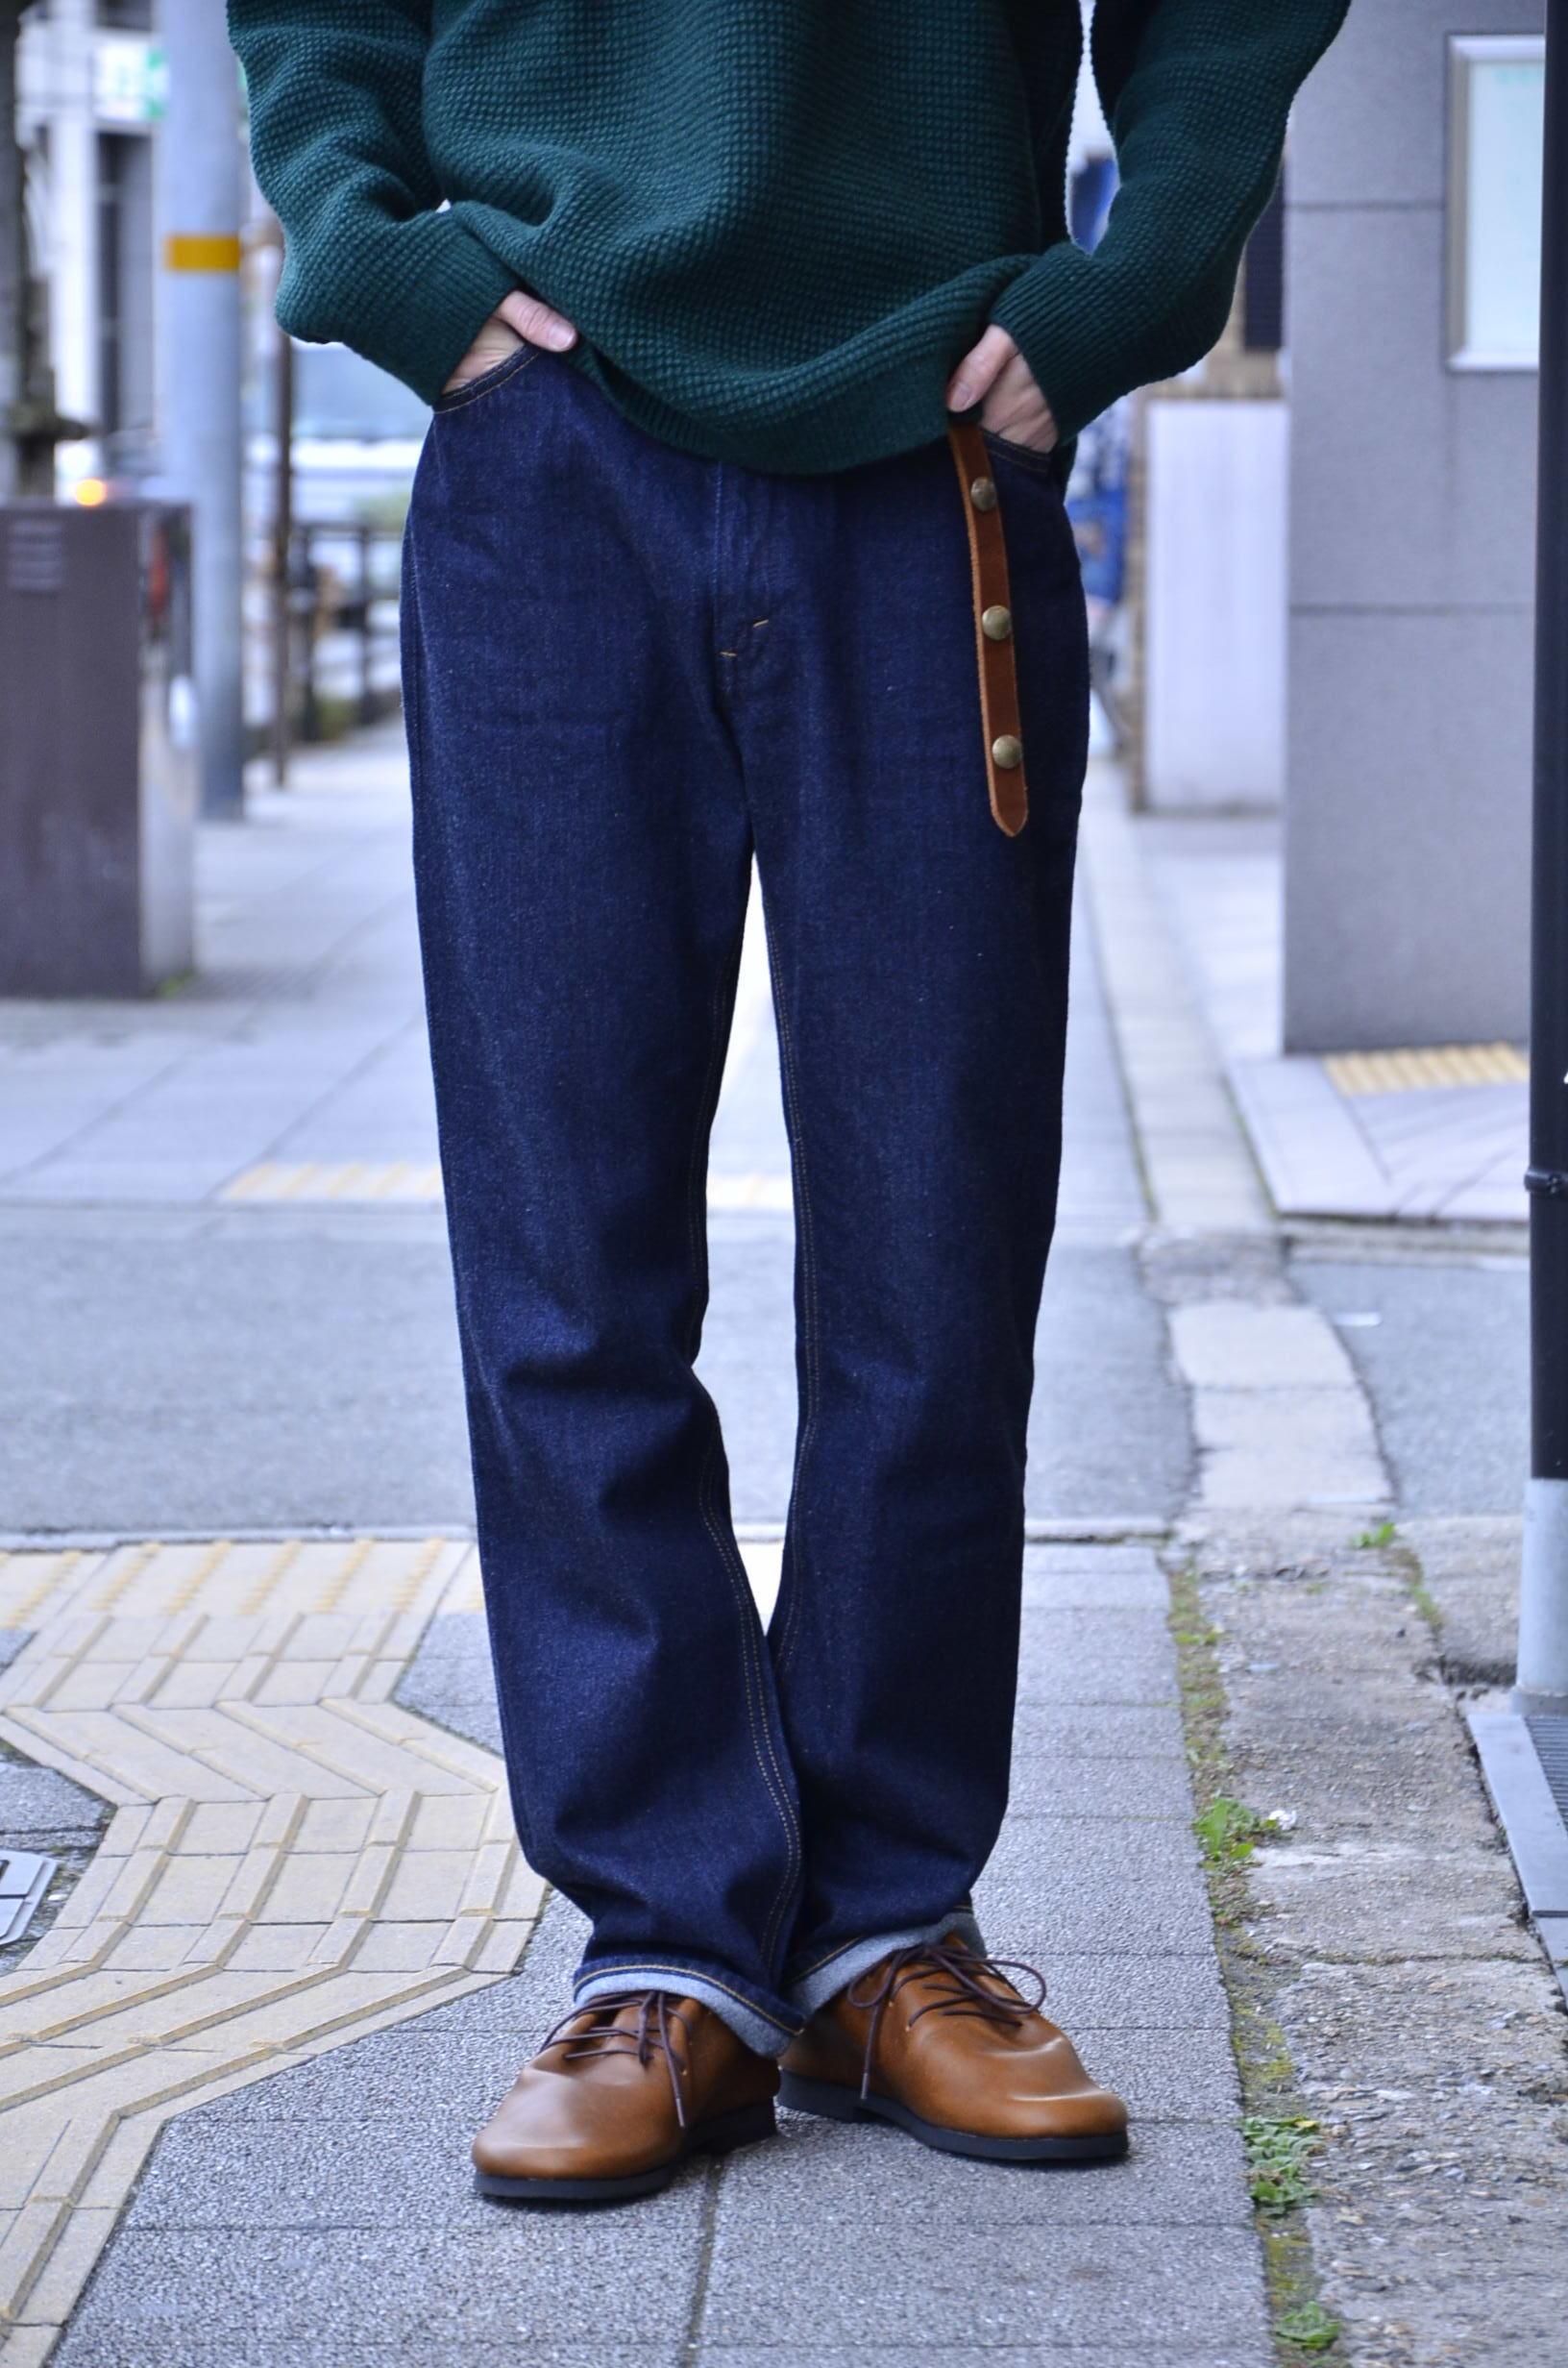 "\""Jackman\""<<Spectator Coat>>Style~KODAI~_c0167336_17364916.jpg"